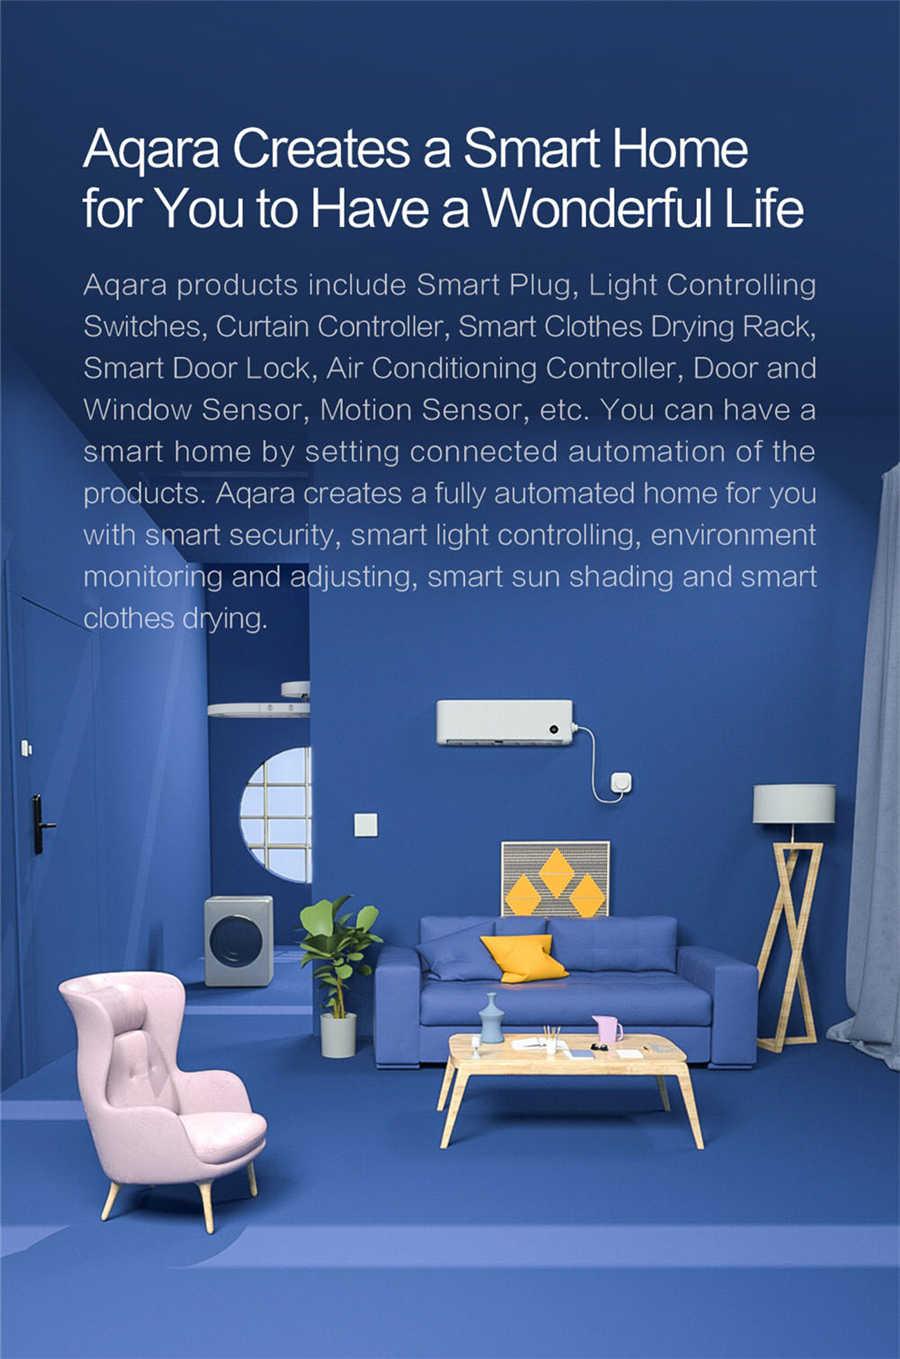 Aqara akıllı duvar anahtarı D1 Zigbee kablosuz ışık anahtarı 3 düğme anahtar nötr ses kontrolü Xiaomi mijia mi ev homekit